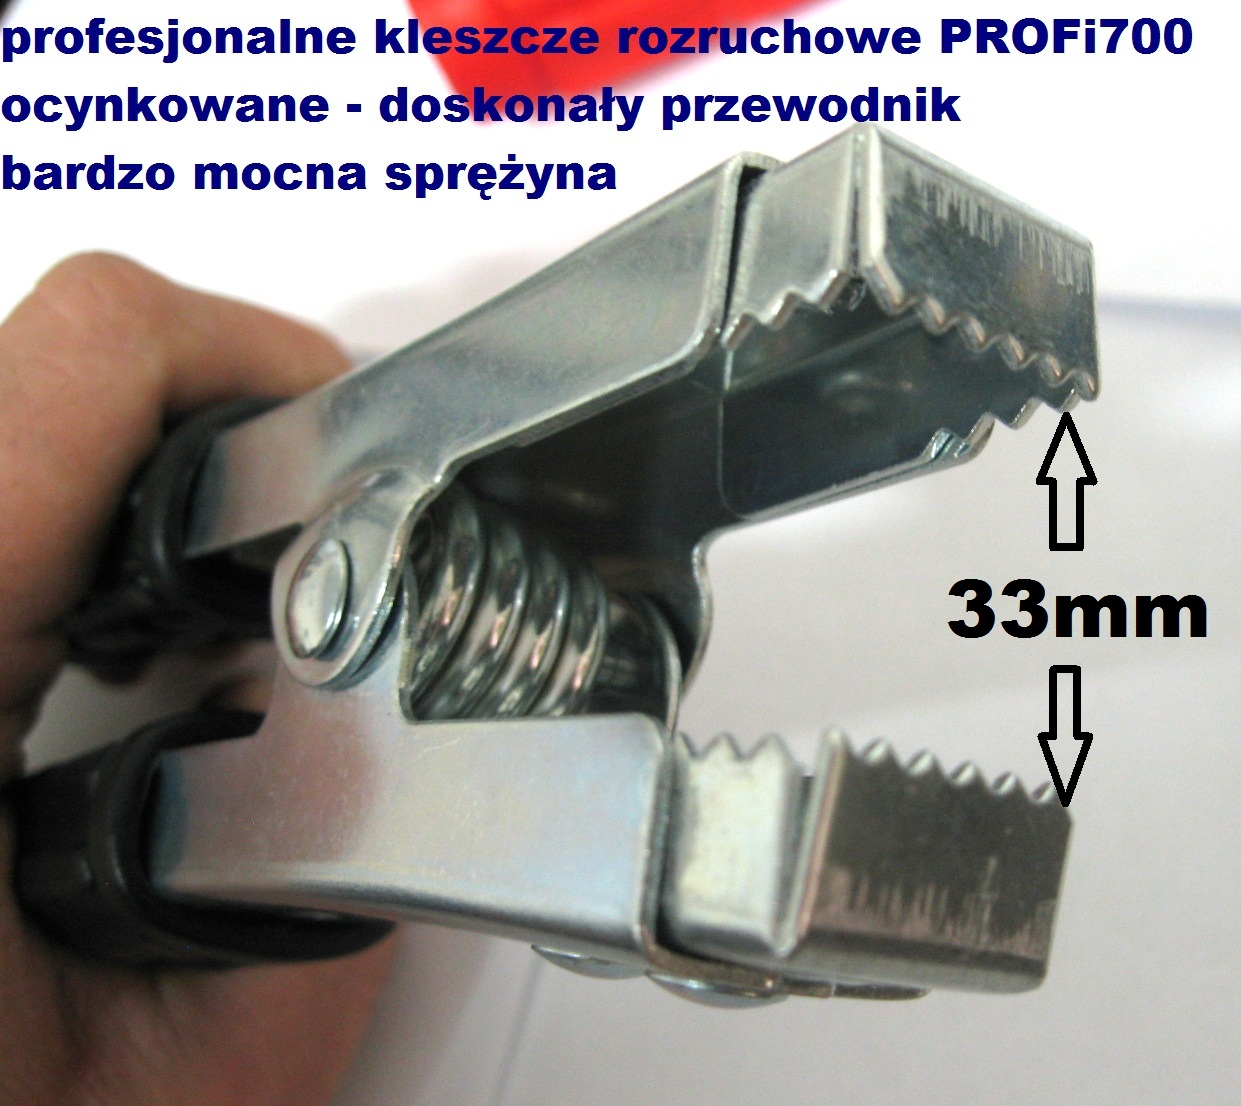 https://img.bazarek.pl/717445/21956/9232310/89896973859df942a68334.jpg